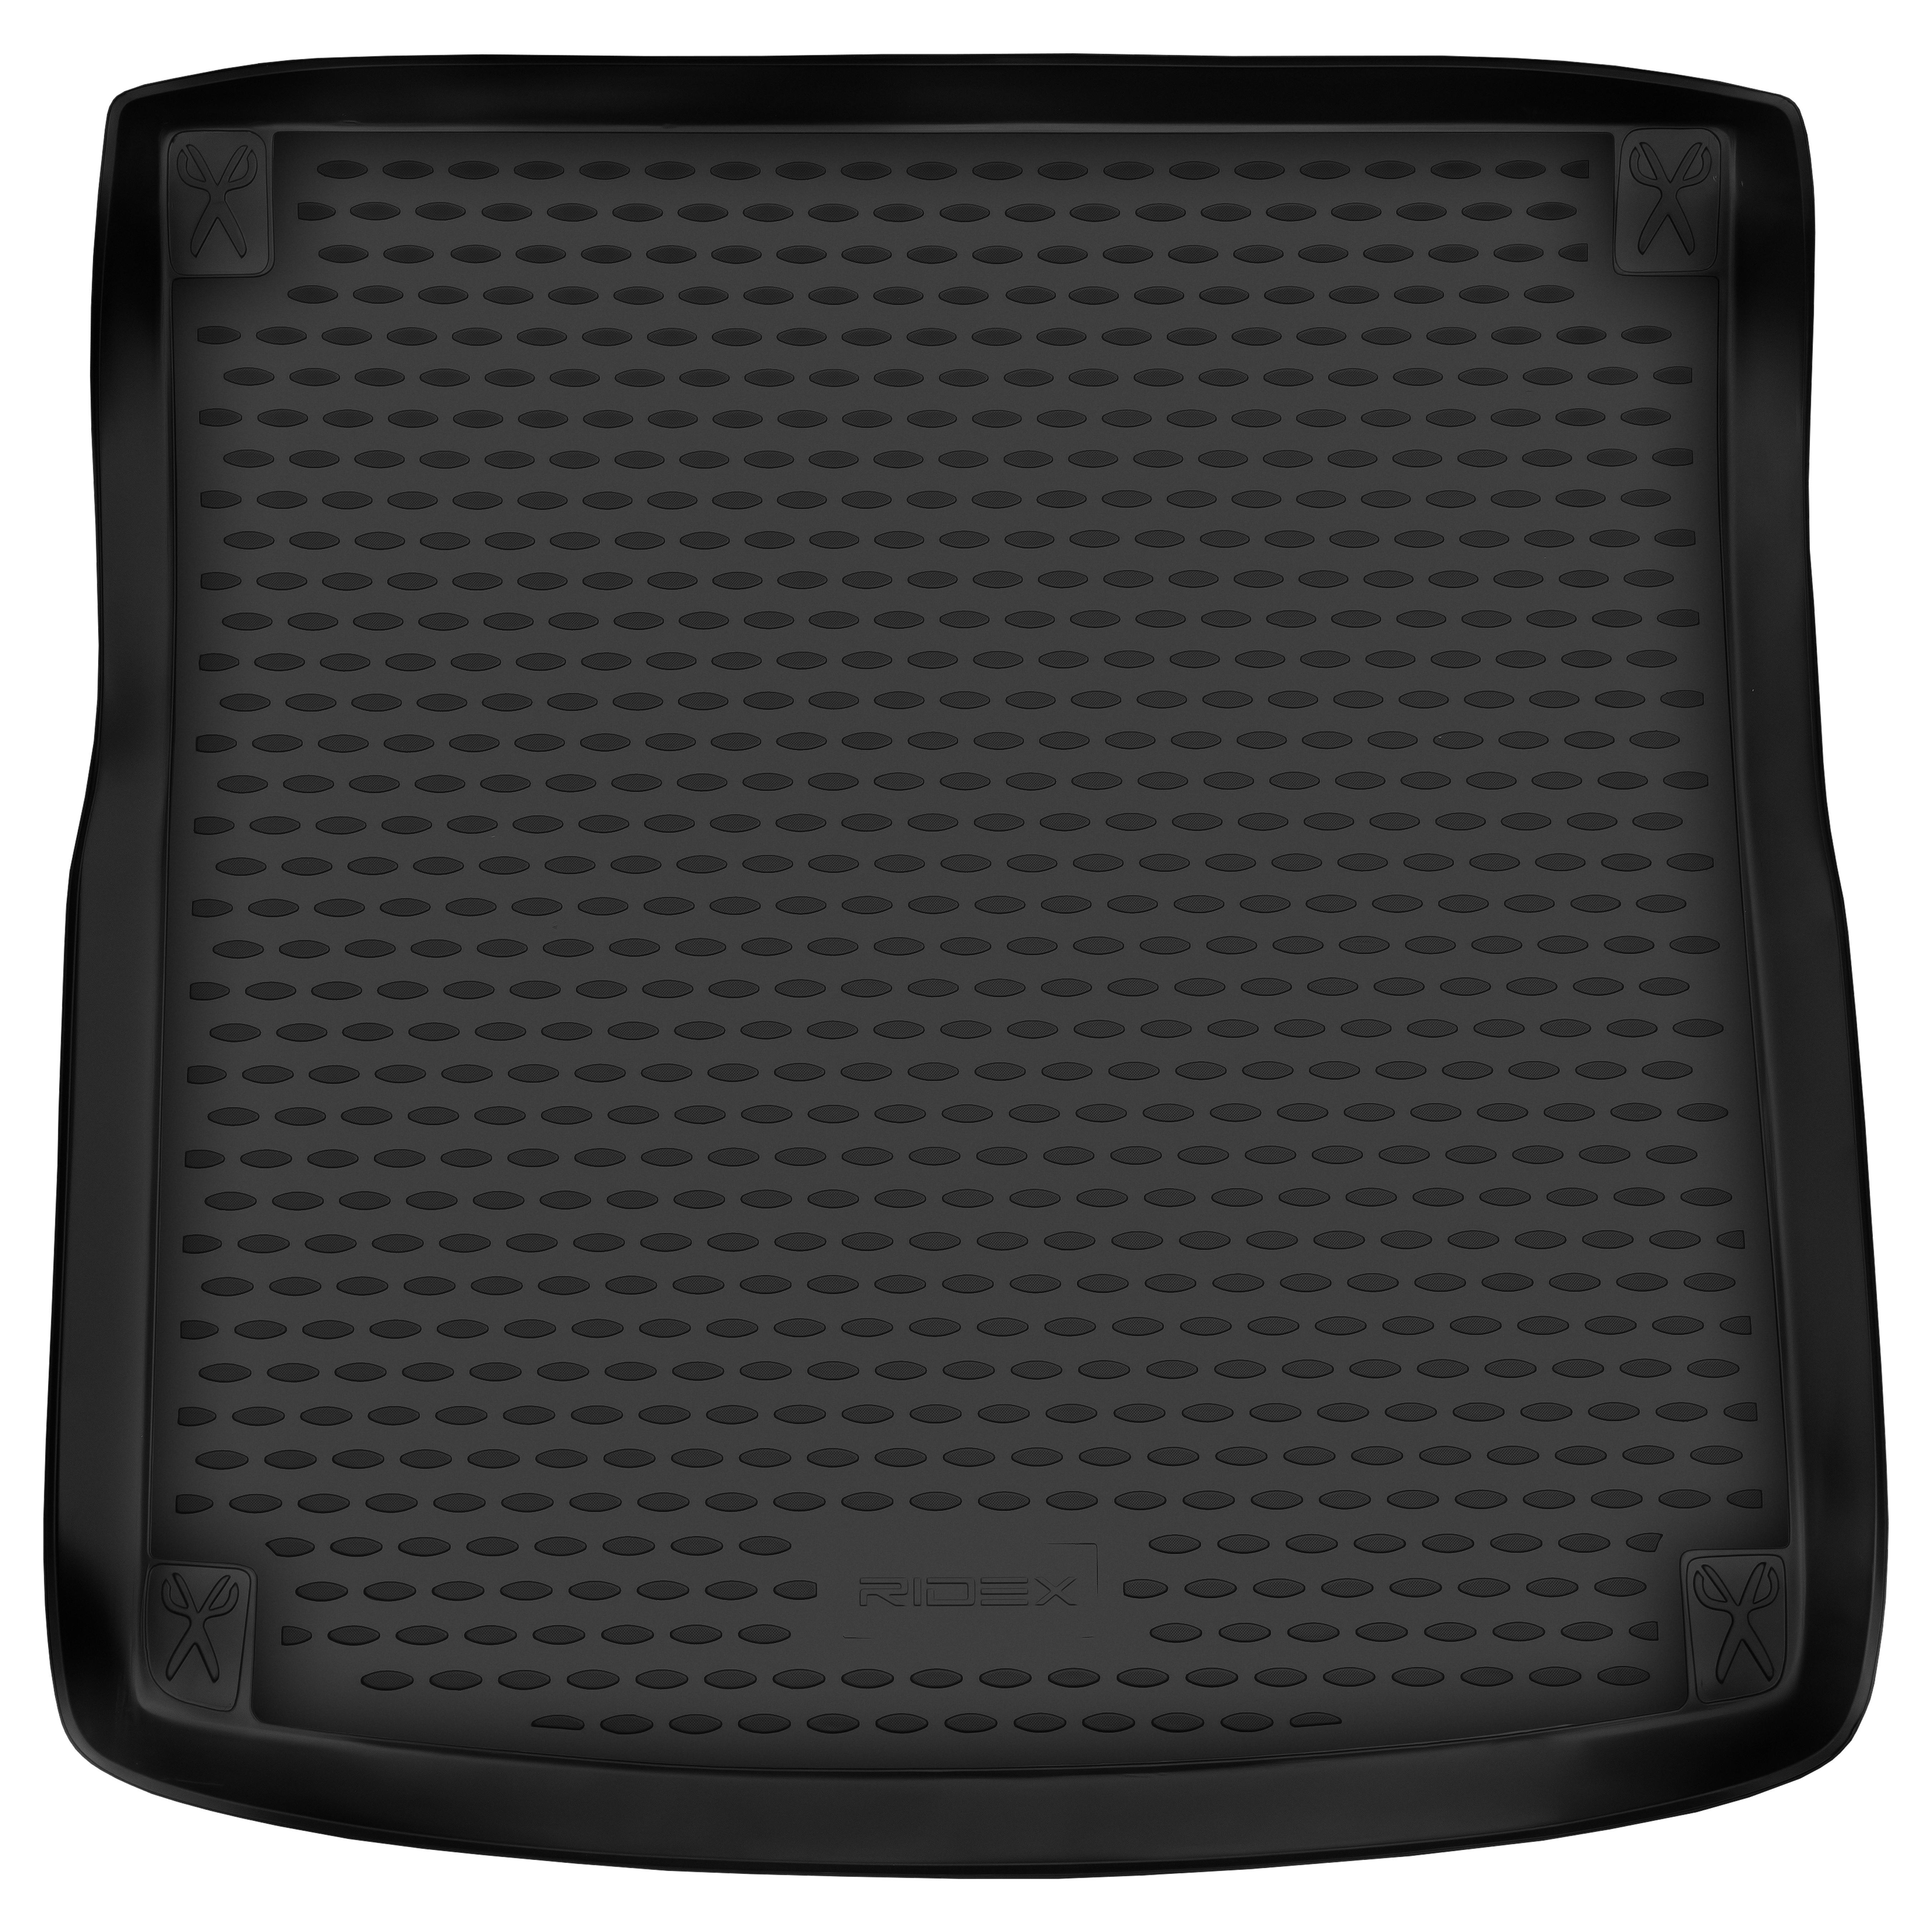 4731A0002 Kofferbakschaal Kofferruimte, Zwart, Rubber van RIDEX tegen lage prijzen – nu kopen!